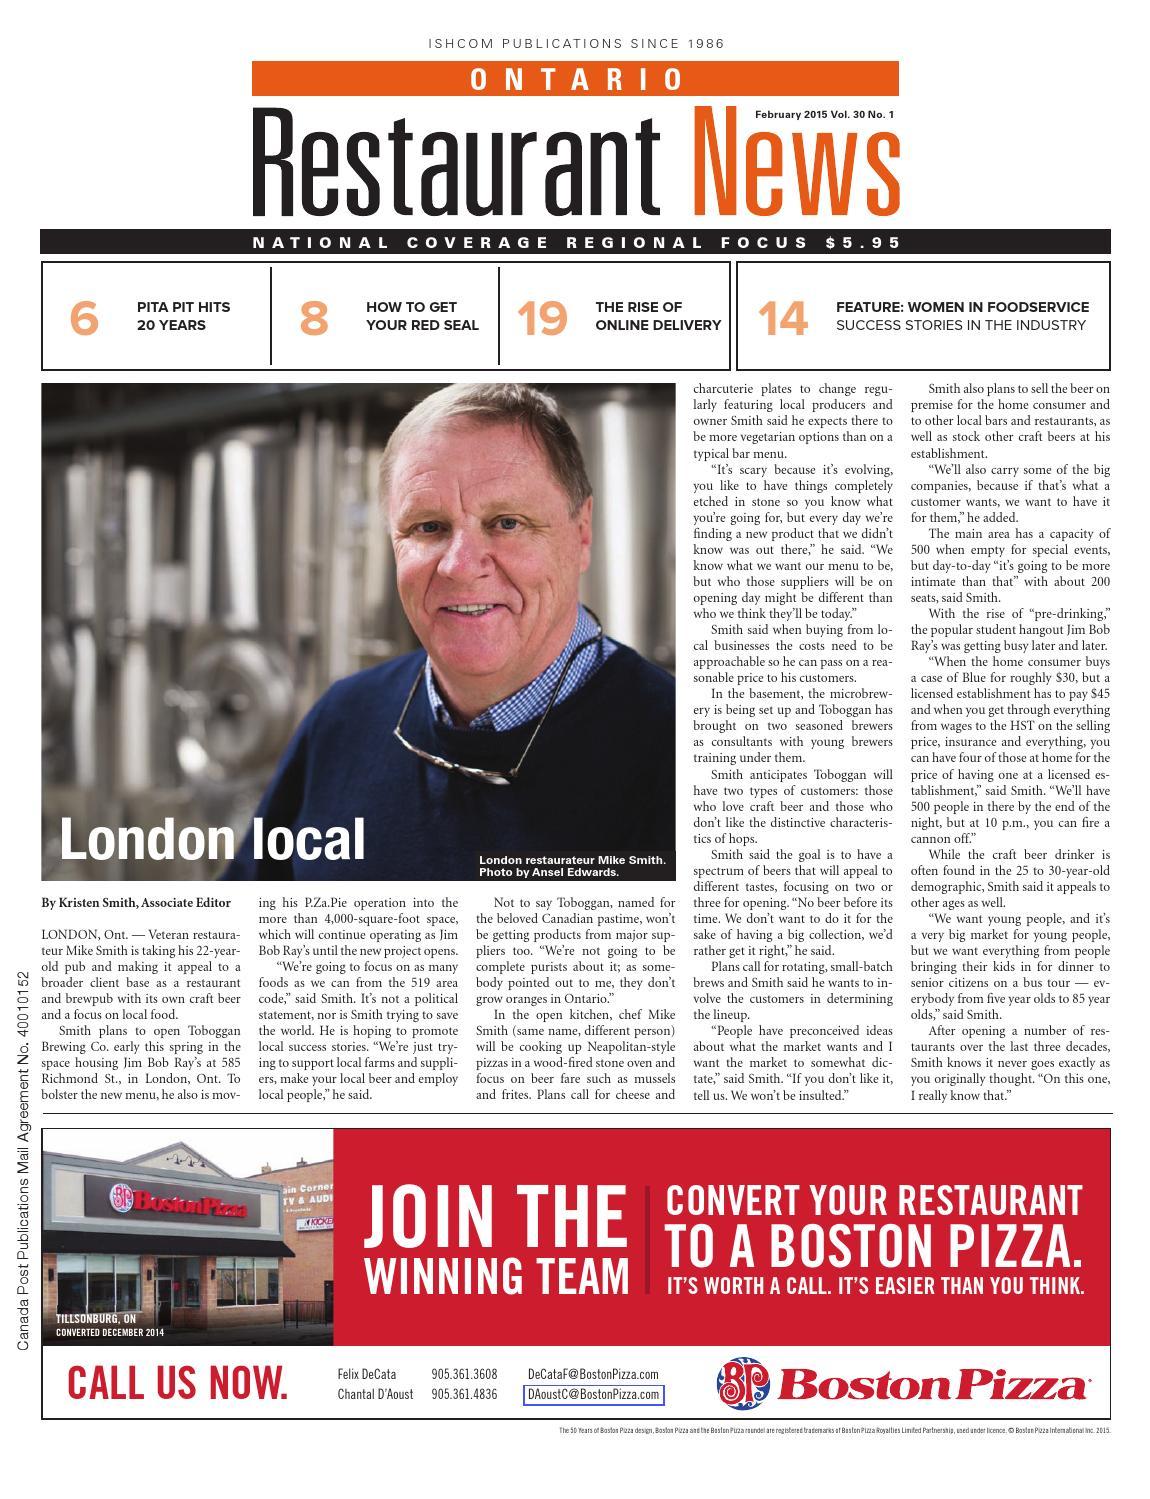 Ontario Restaurant News - February 2015 by Ishcom Publications - issuu